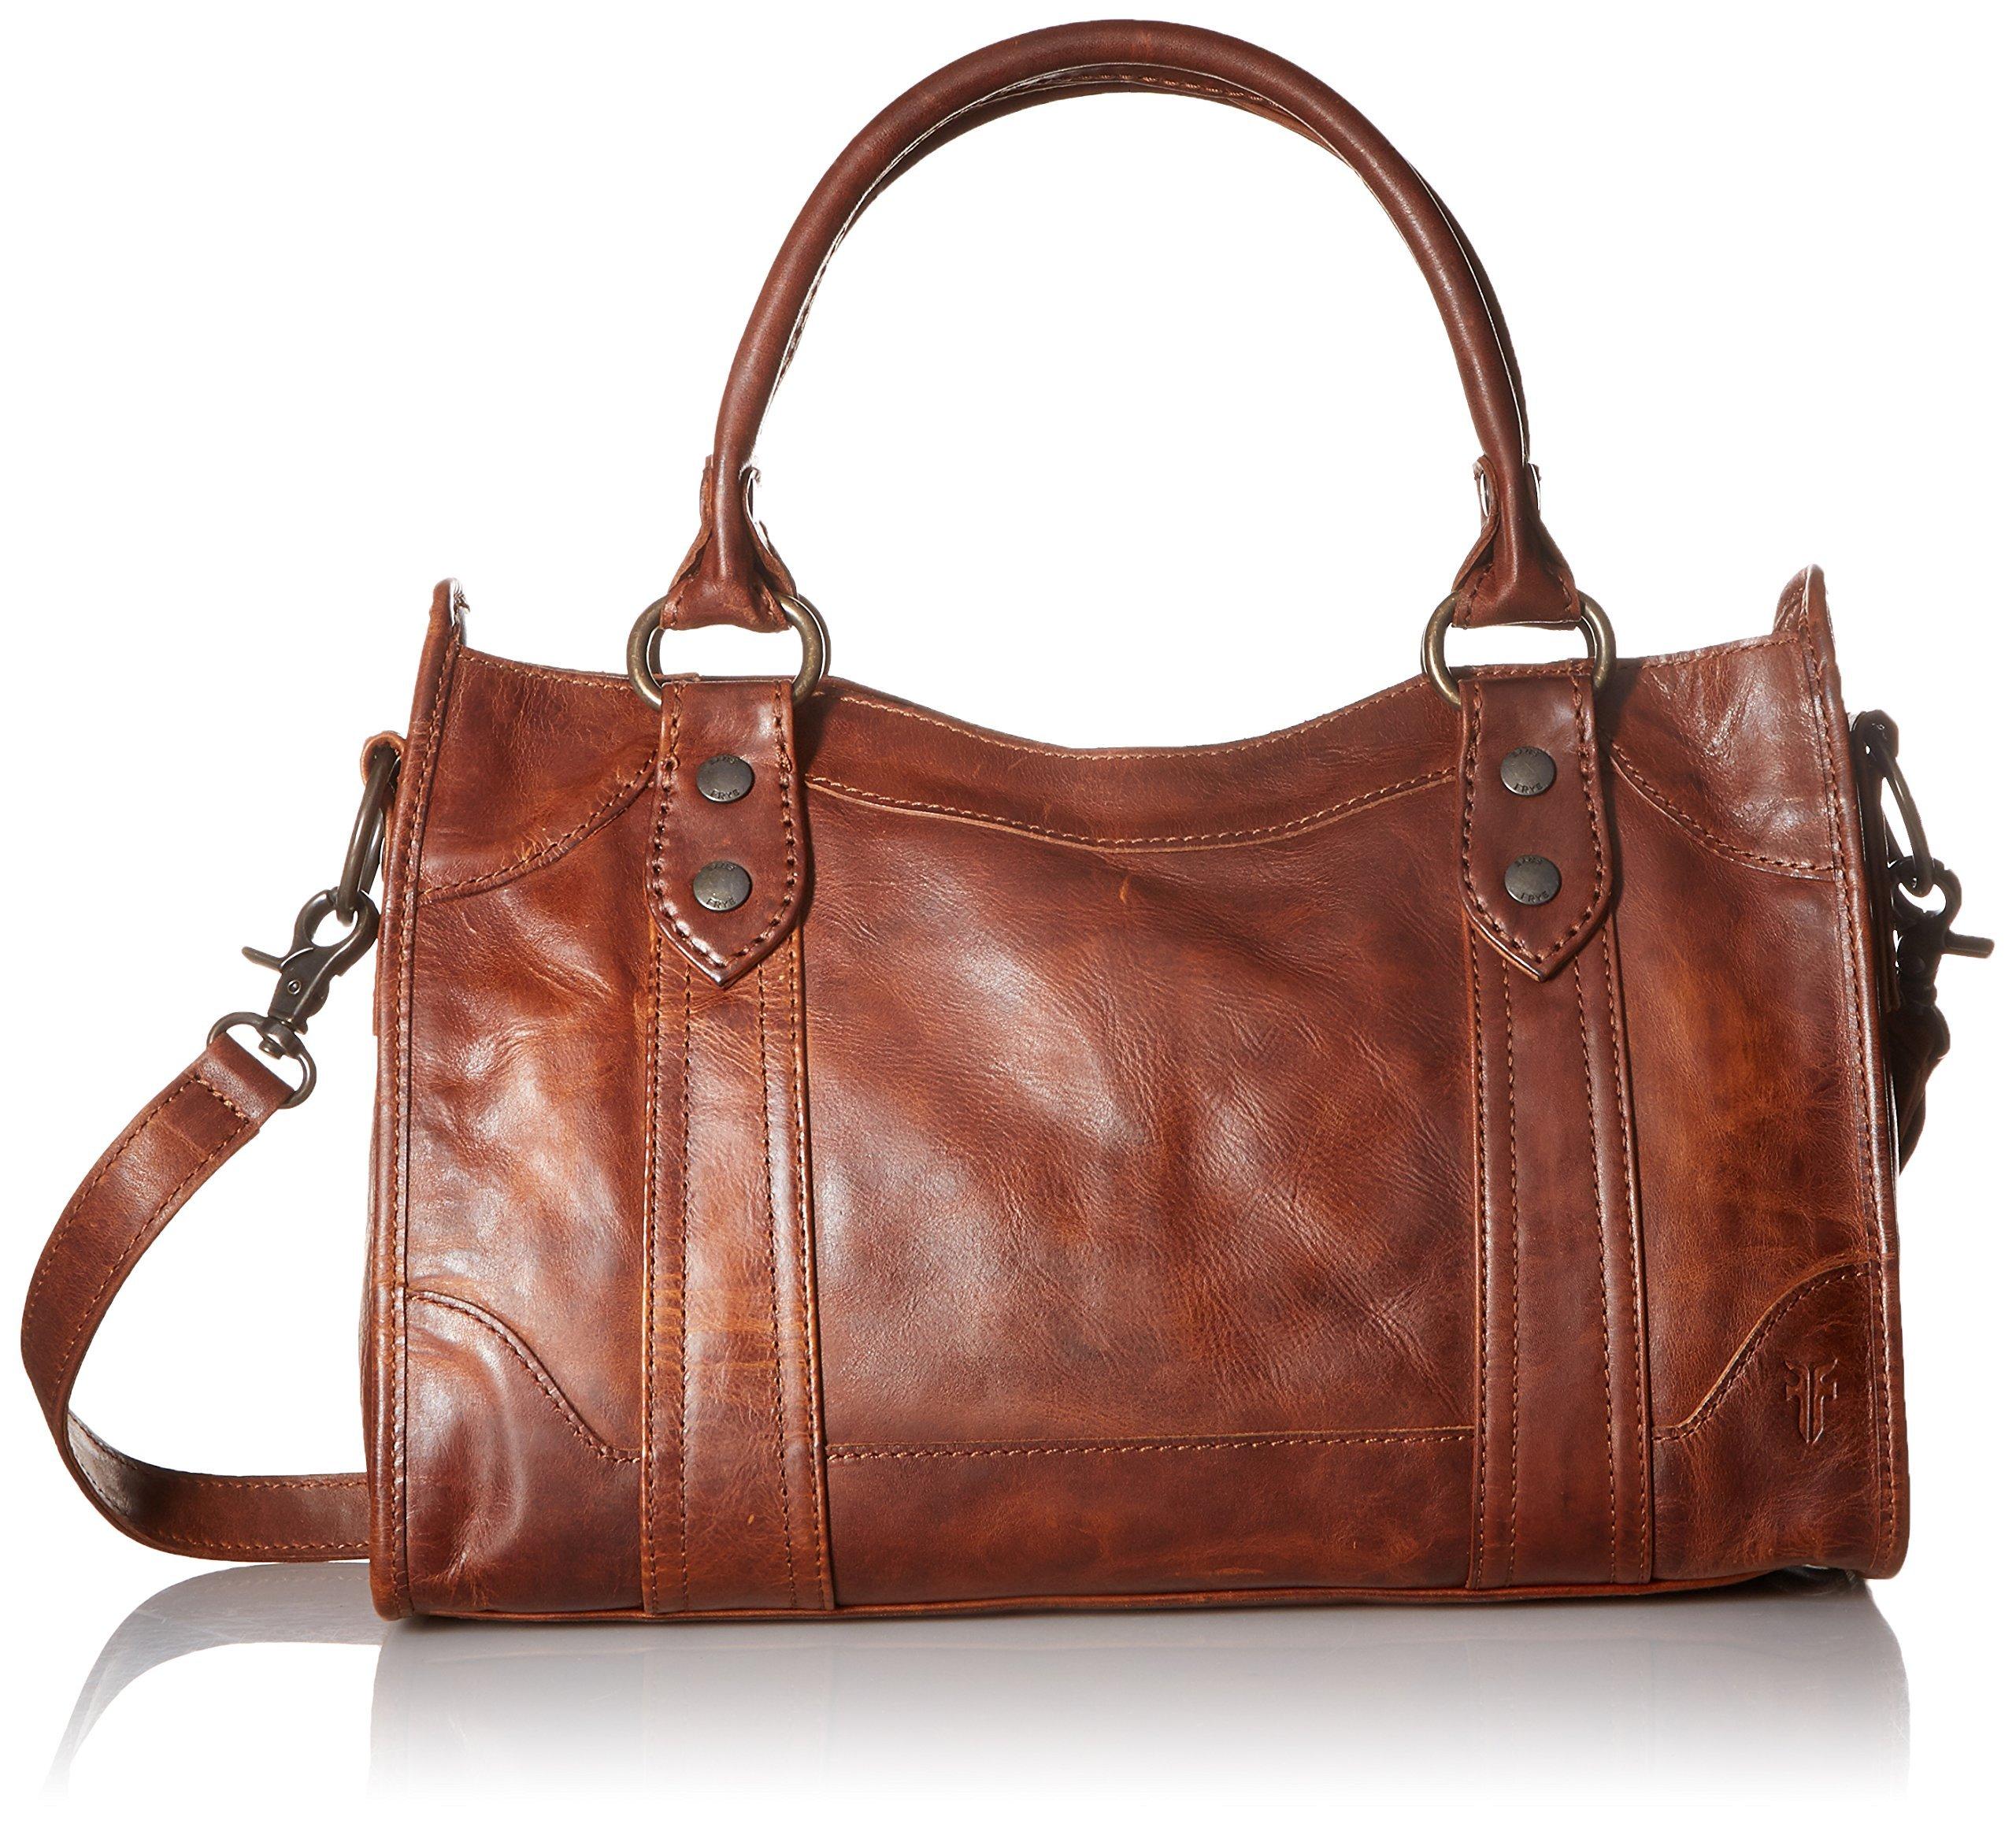 FRYE Melissa Satchel Handbag,Cognac,One Size